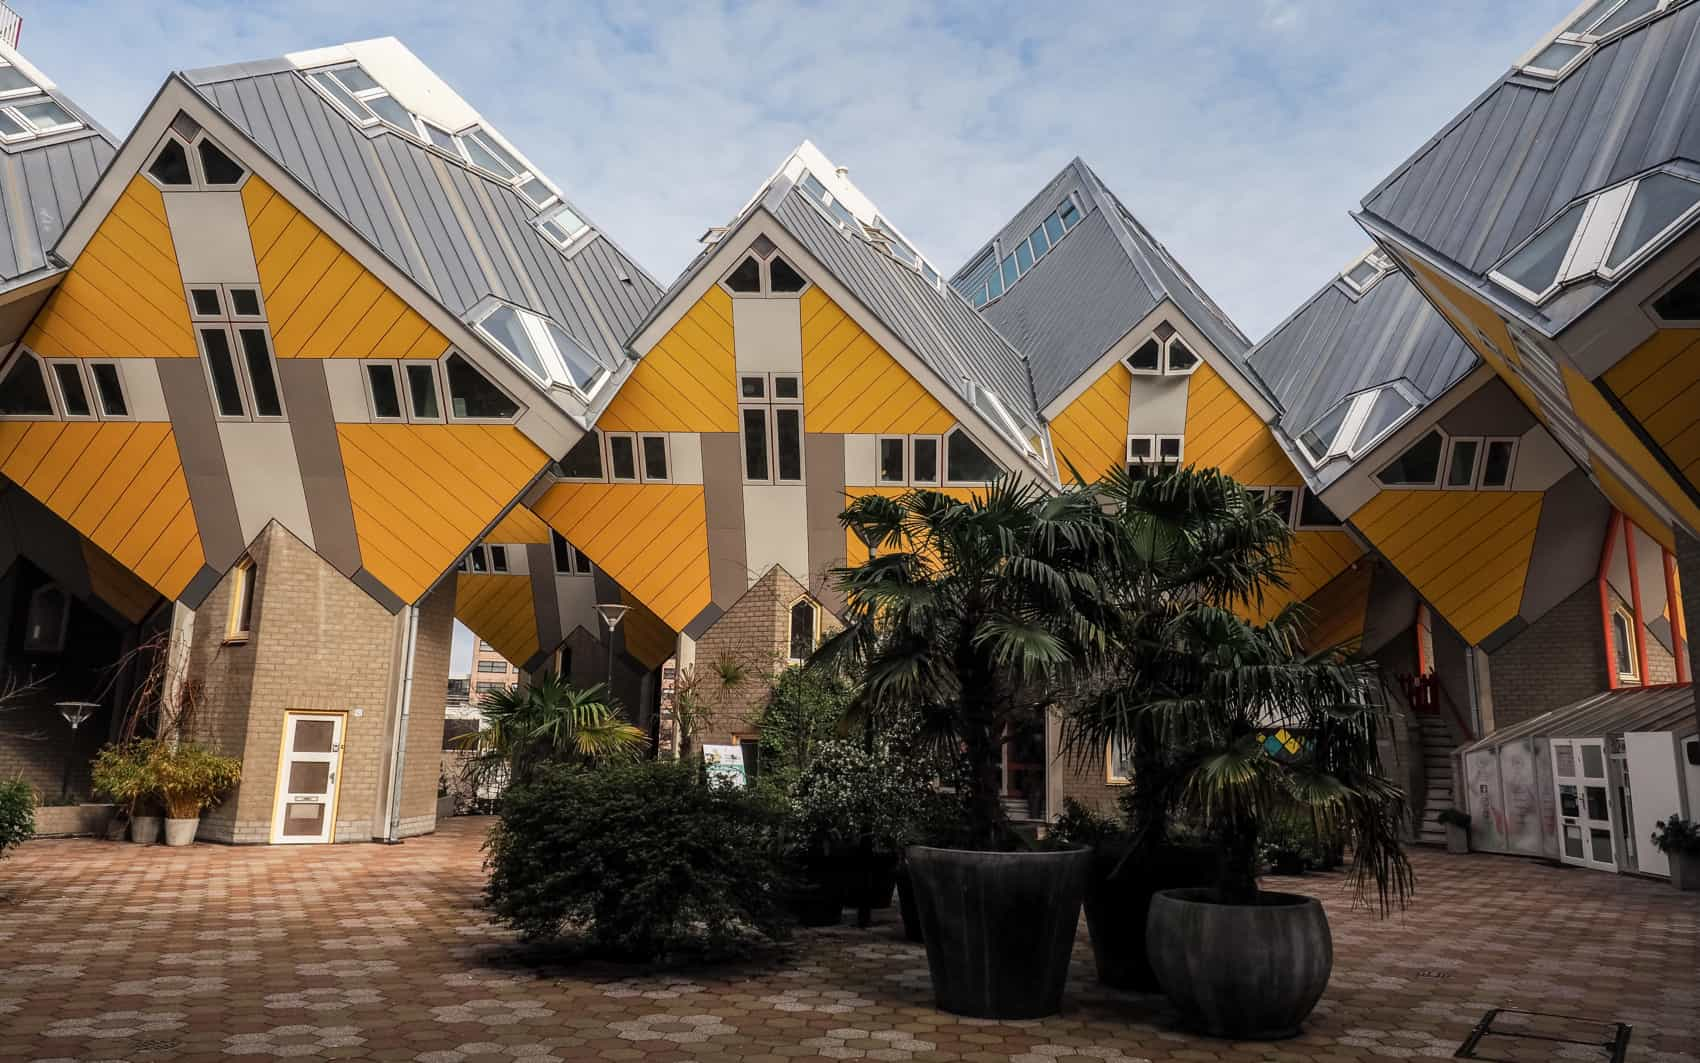 Kijk-kubus de Rotterdam